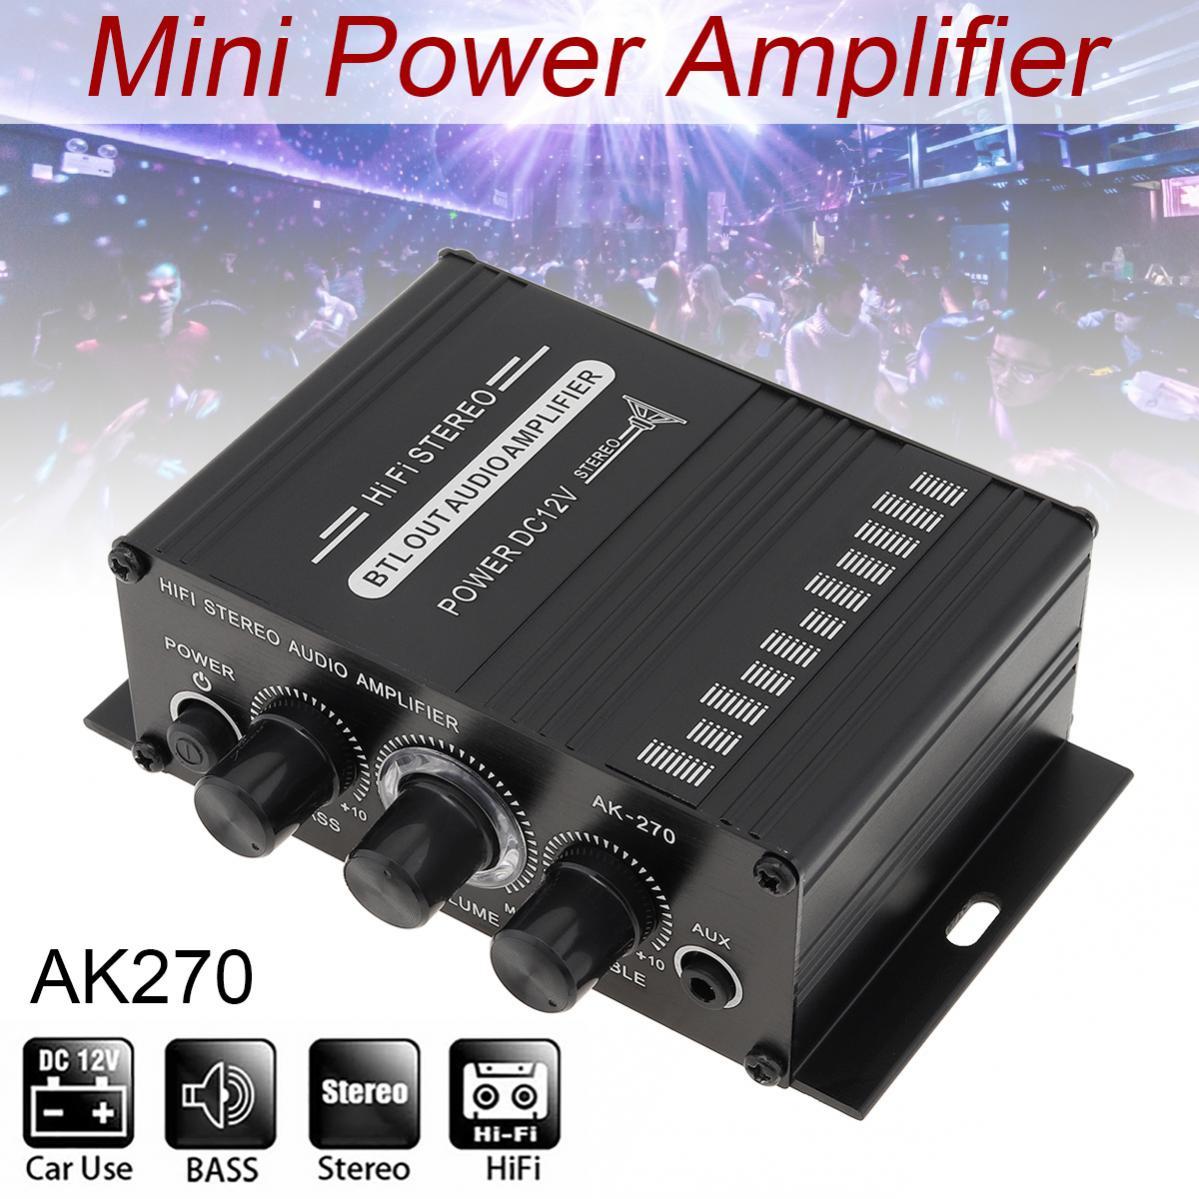 Car  Amplifier Audio Karaoke Home Theater Amplifier 2 Channel Bluetooth Class D Amplifier USB/SD AUX Input